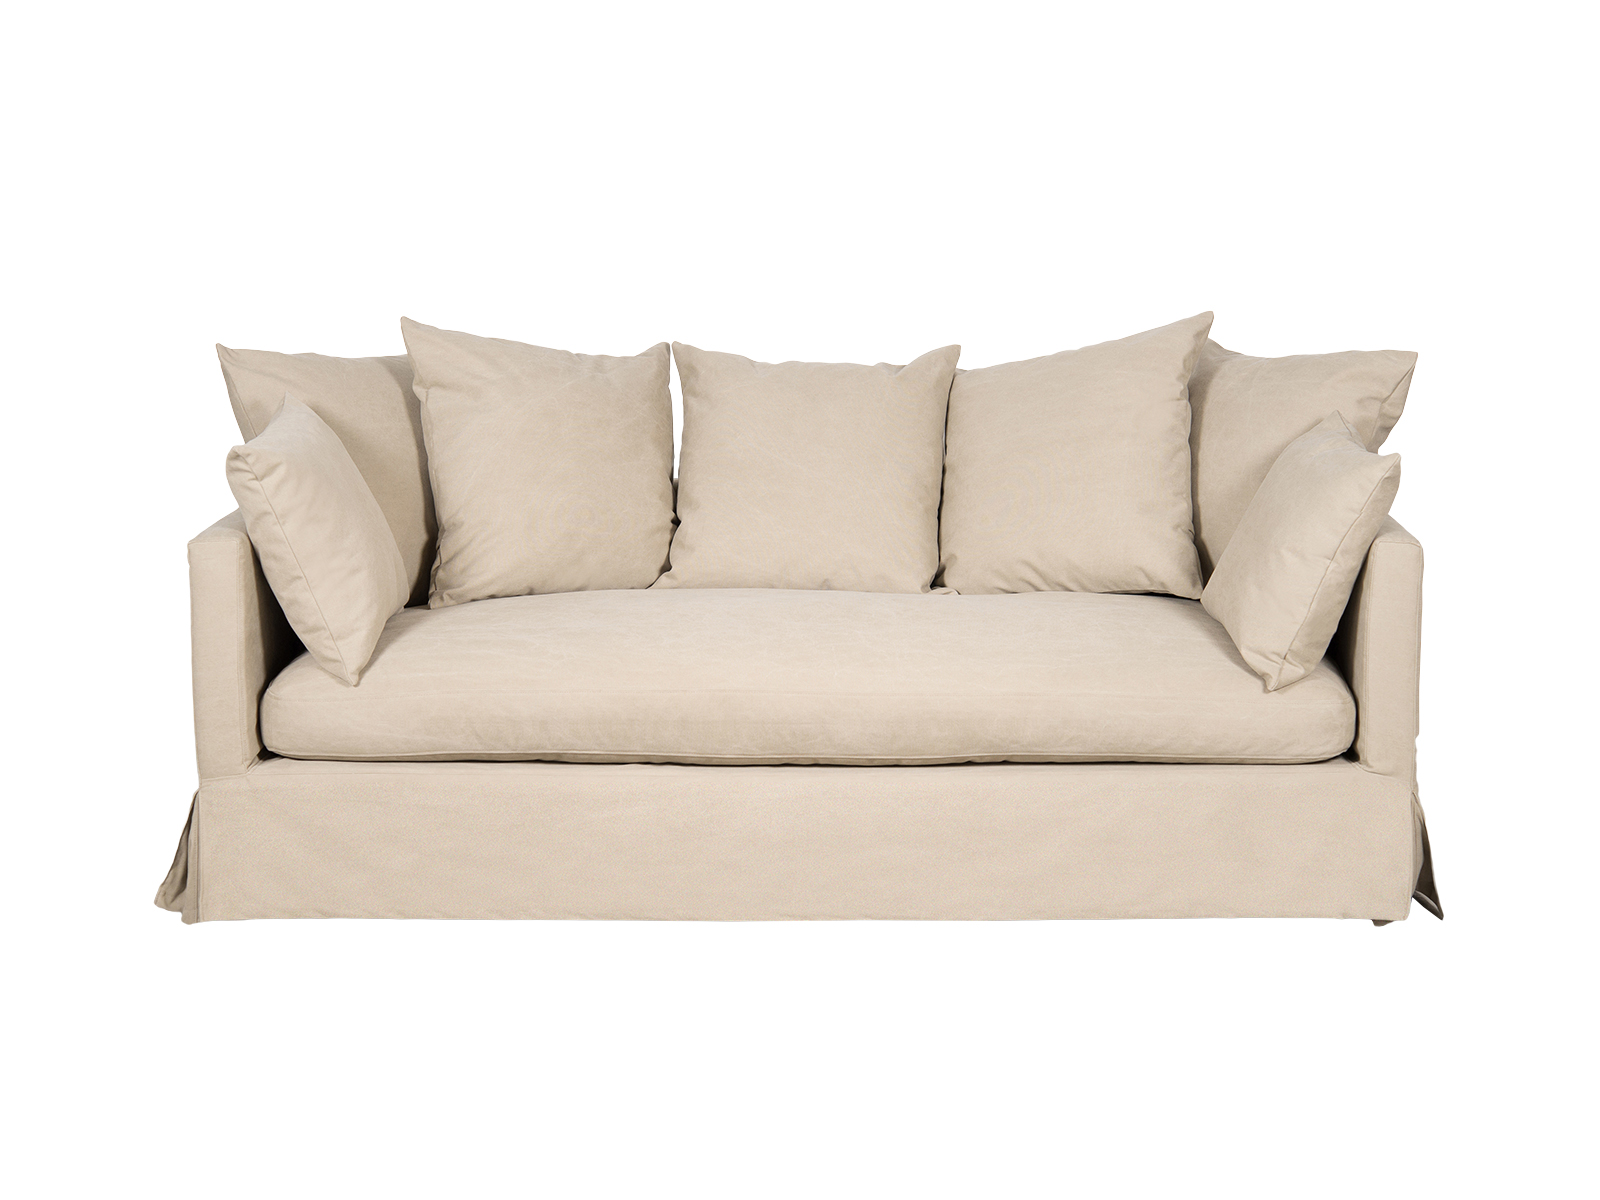 Canapea fixa 2 locuri Simone